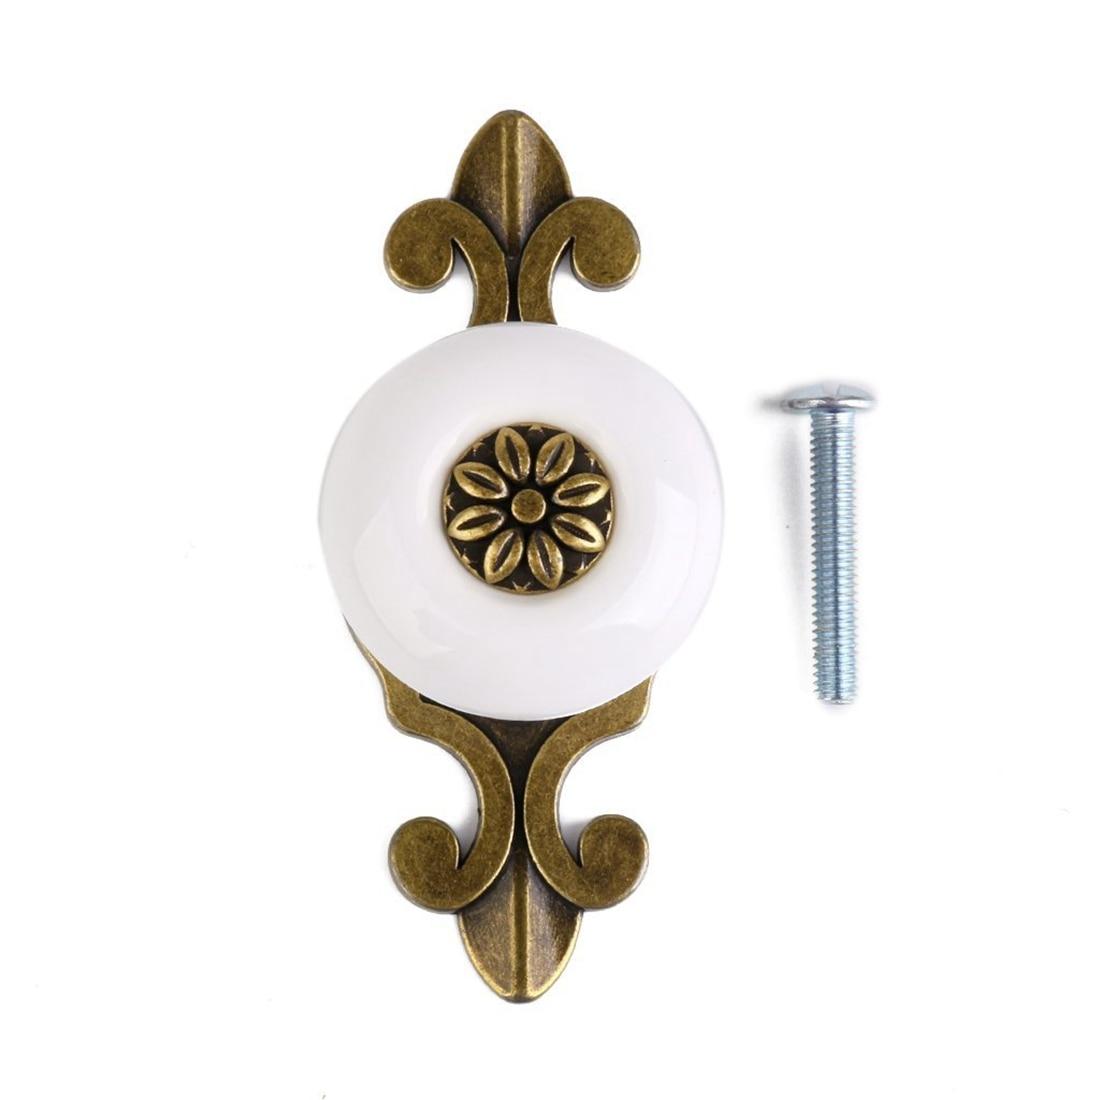 CNIM Hot 1pc Retro Furniture Drawer Cabinet Wardrobe Ceramic Round Knob Metal Pull Handle (Bronze + White)